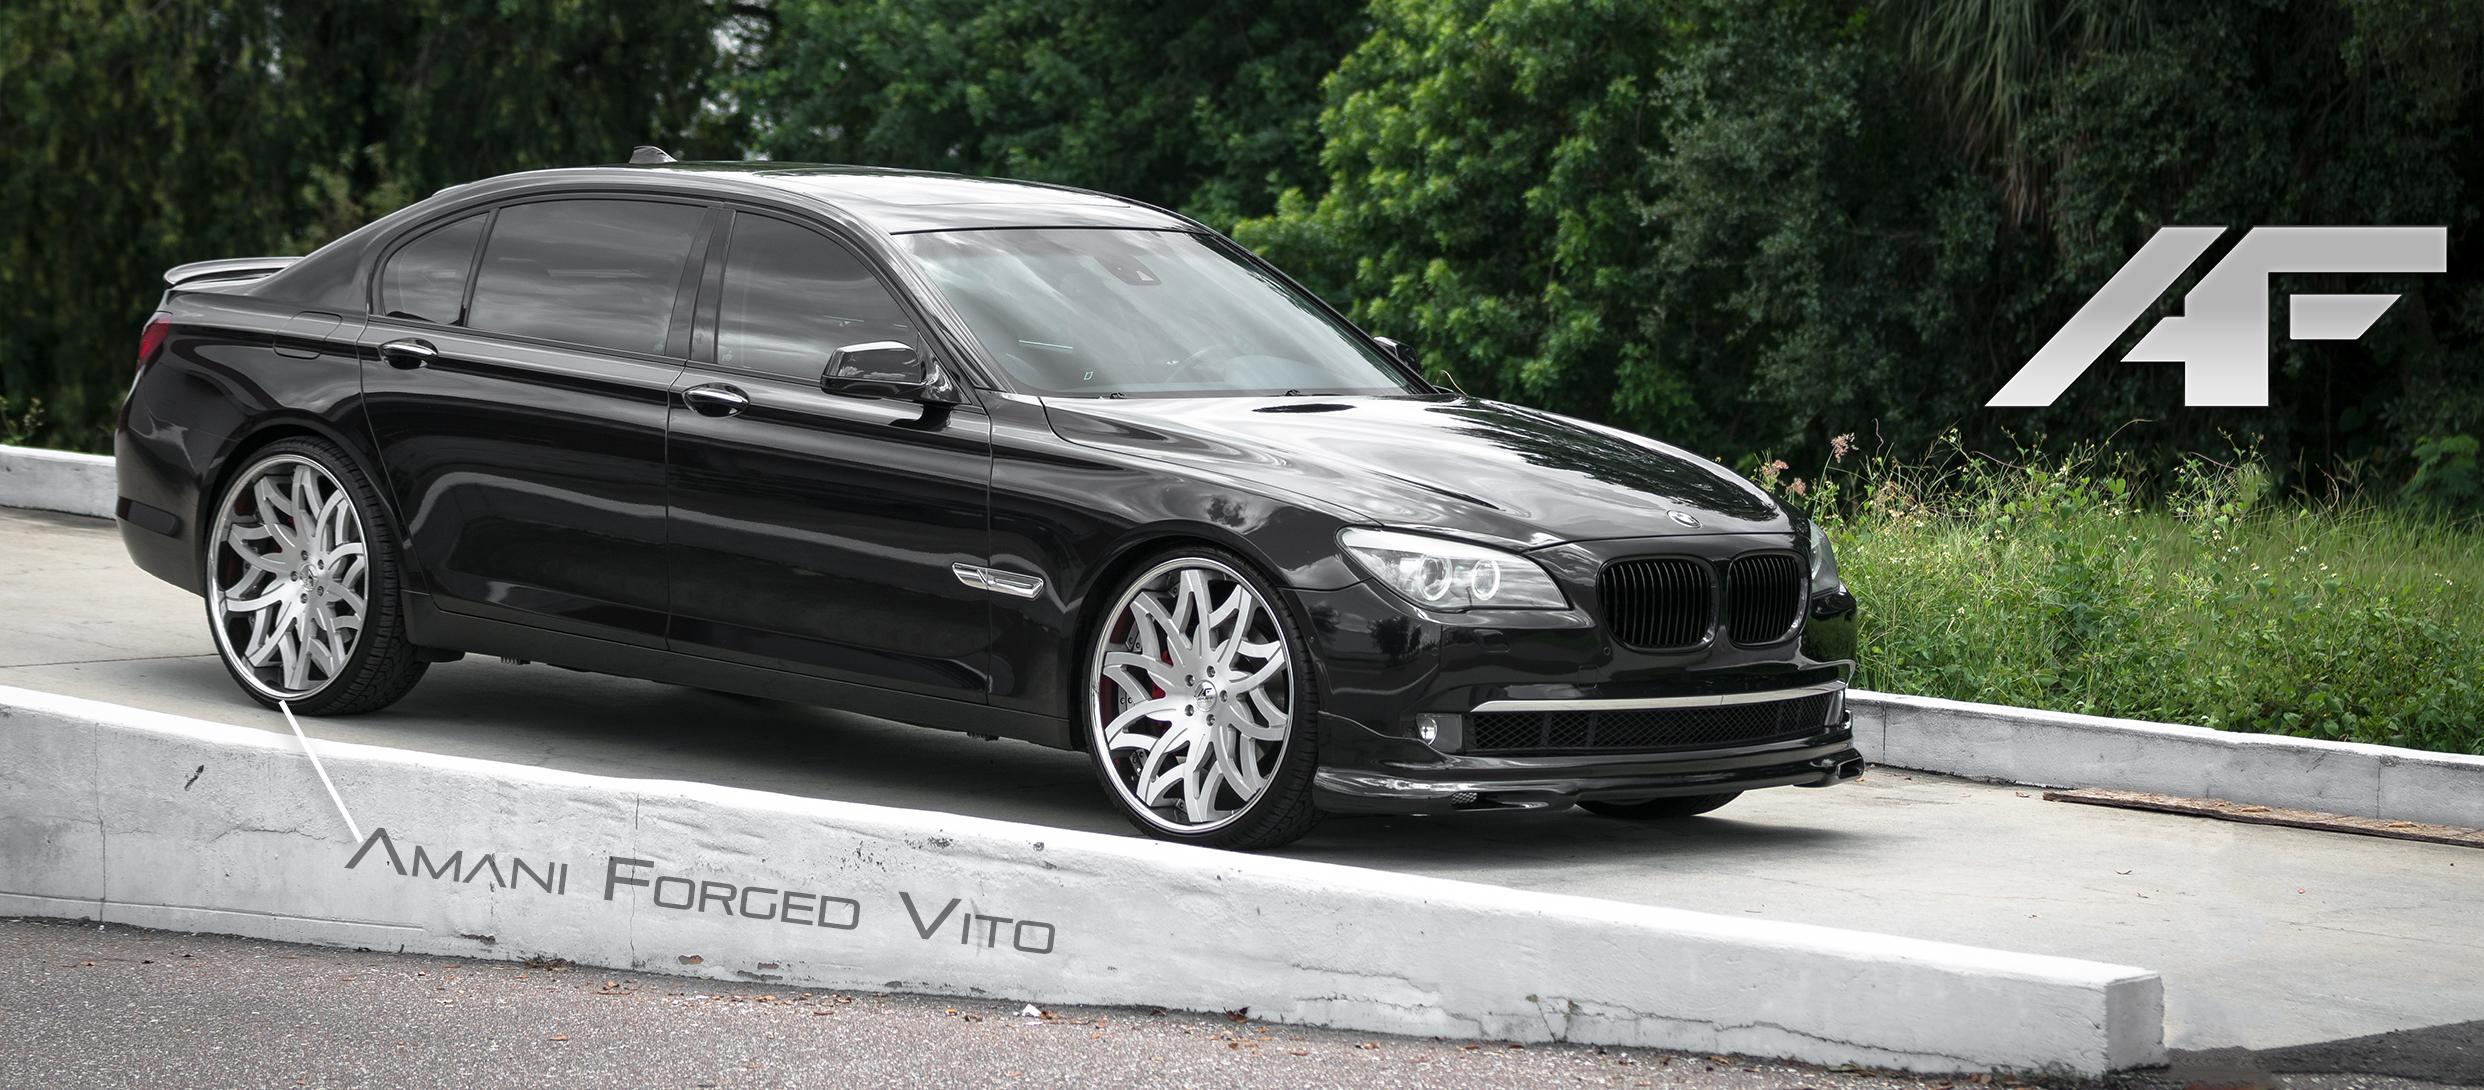 BMW 745 on Vito